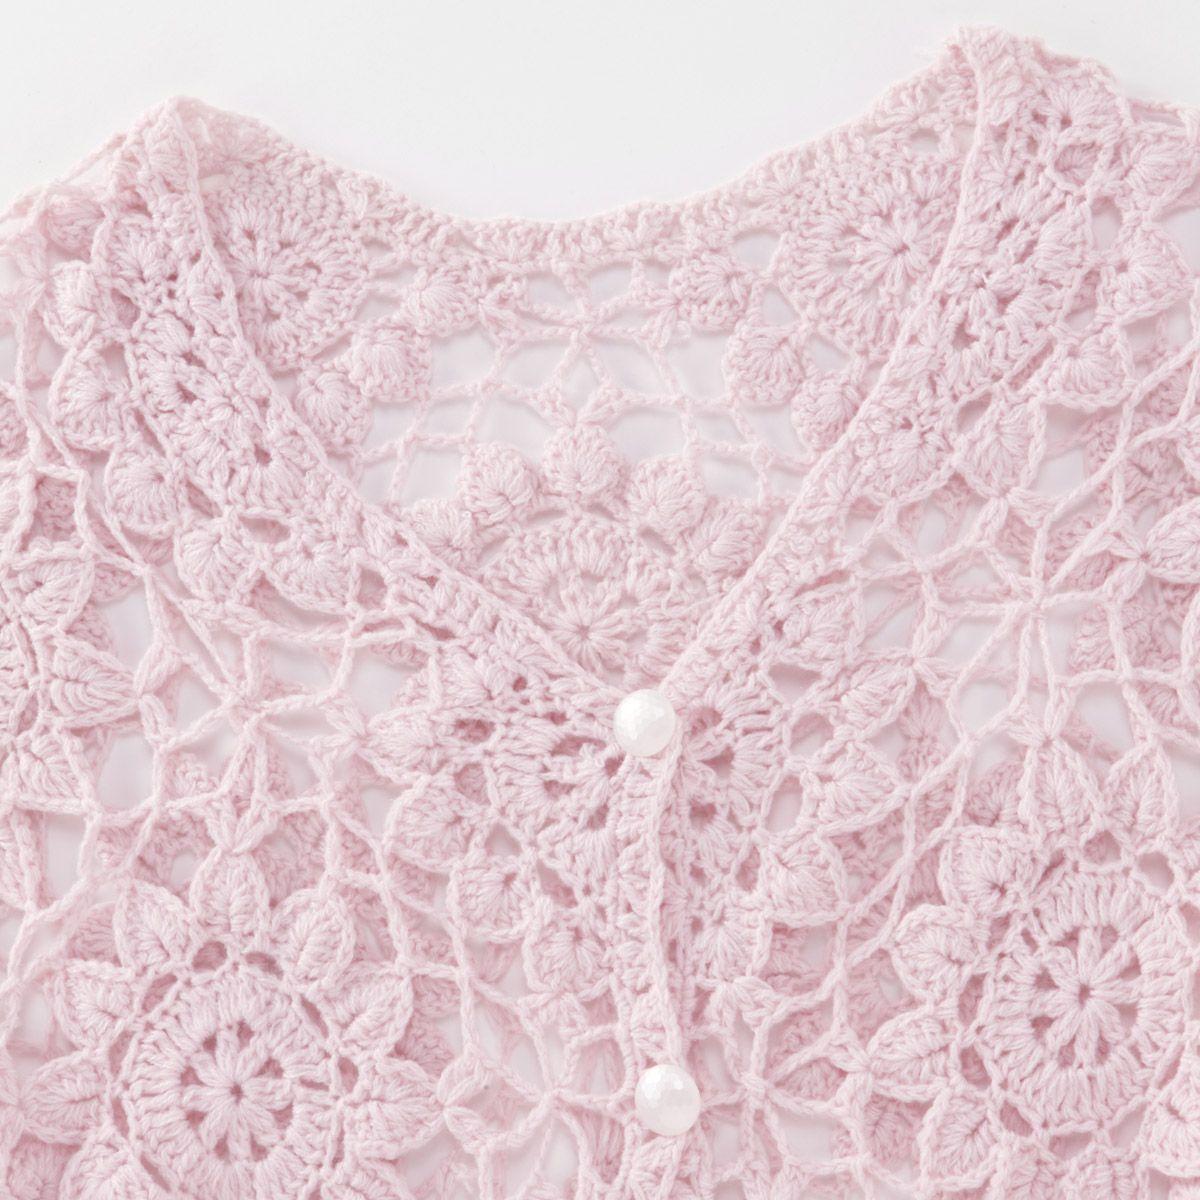 blusas tejidas en crochet imagenes - Căutare Google